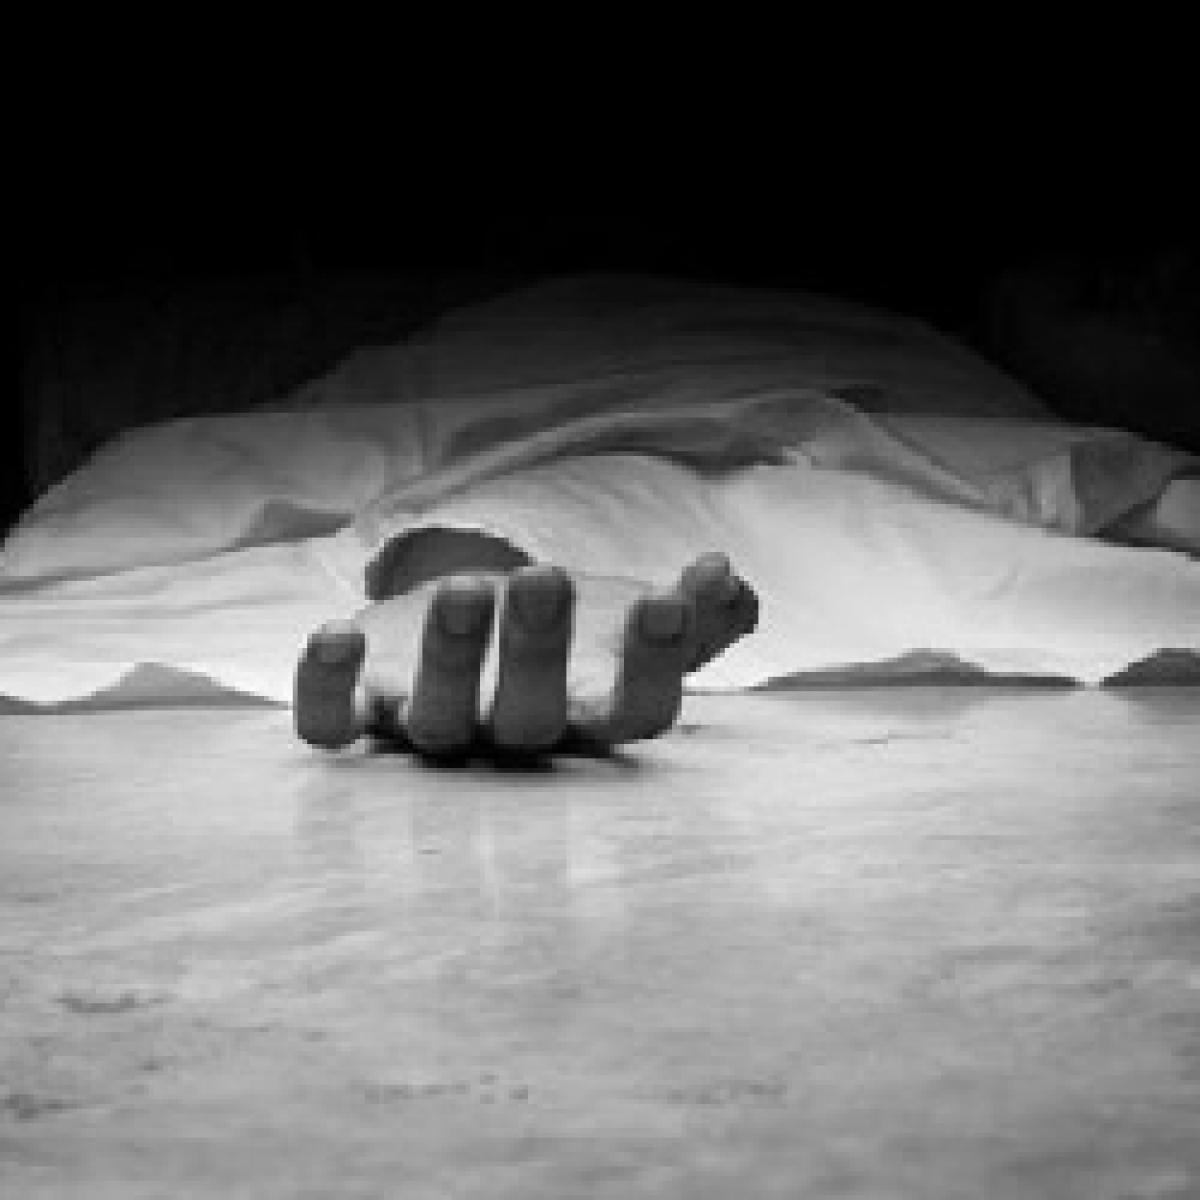 13-year-old girl dies during dance practice in Maharashtra's school